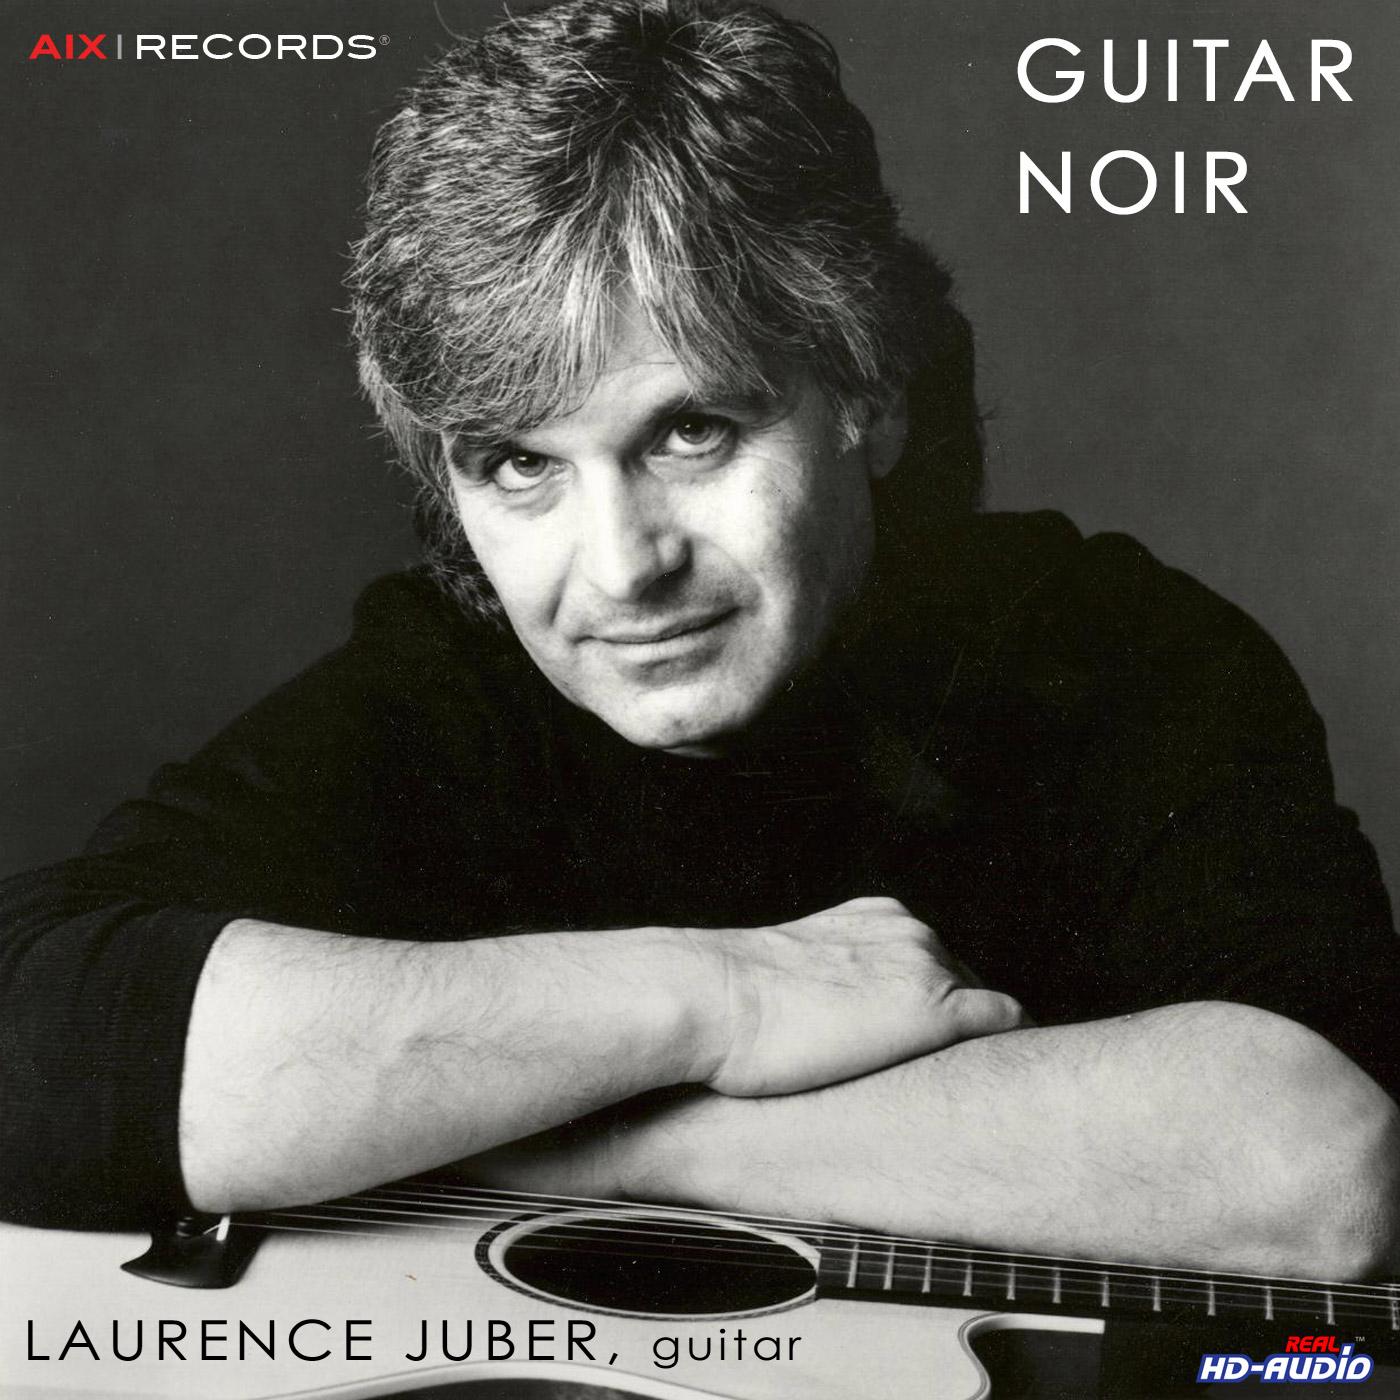 laurence_juber_guitar_noir_cover